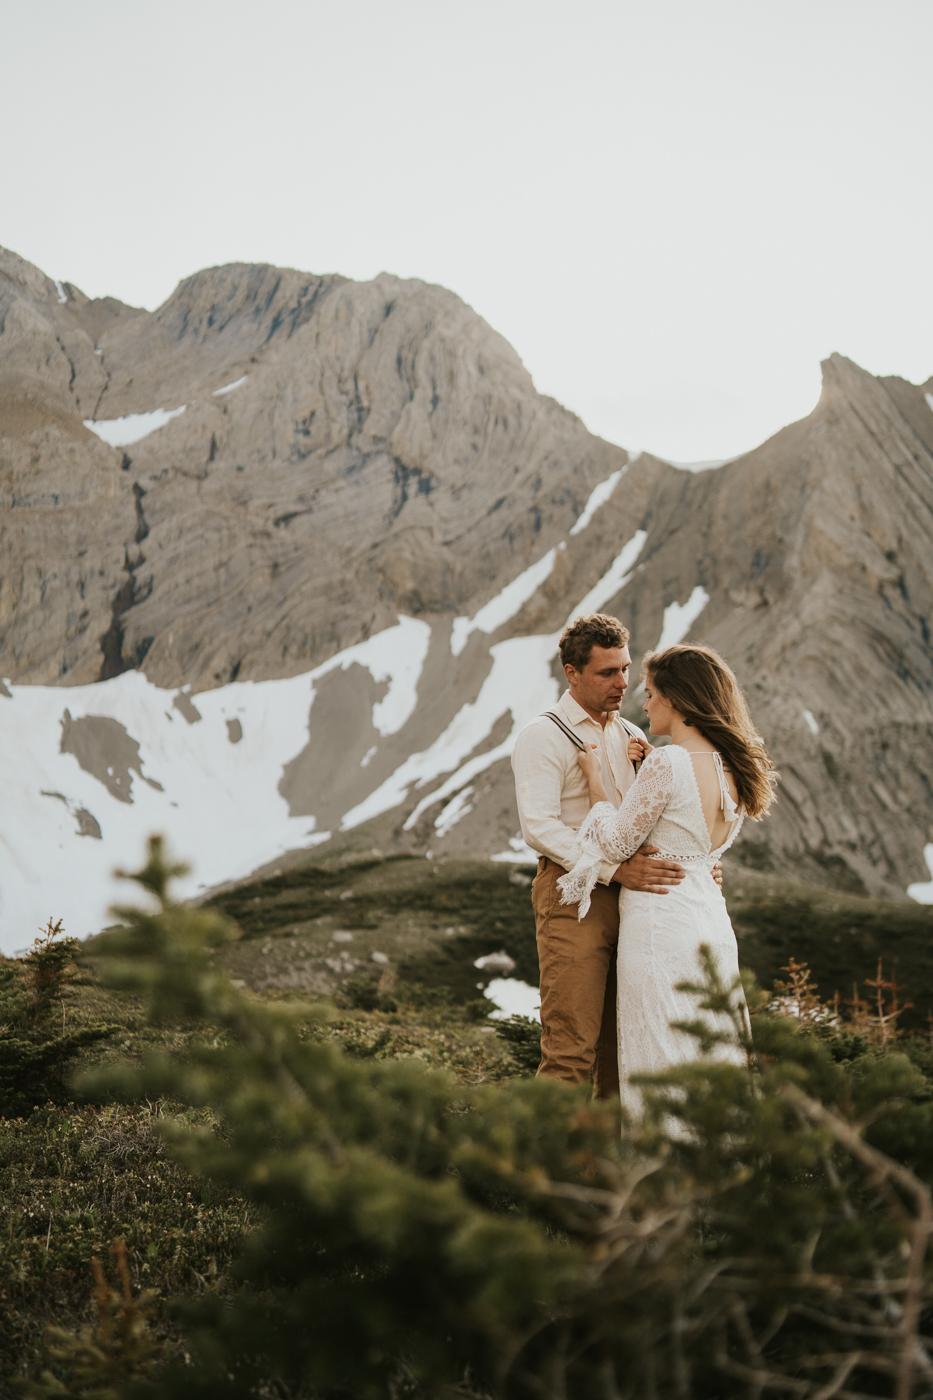 tyraephotography_photographer_wedding_elopement_engagement_photography-07981.jpg